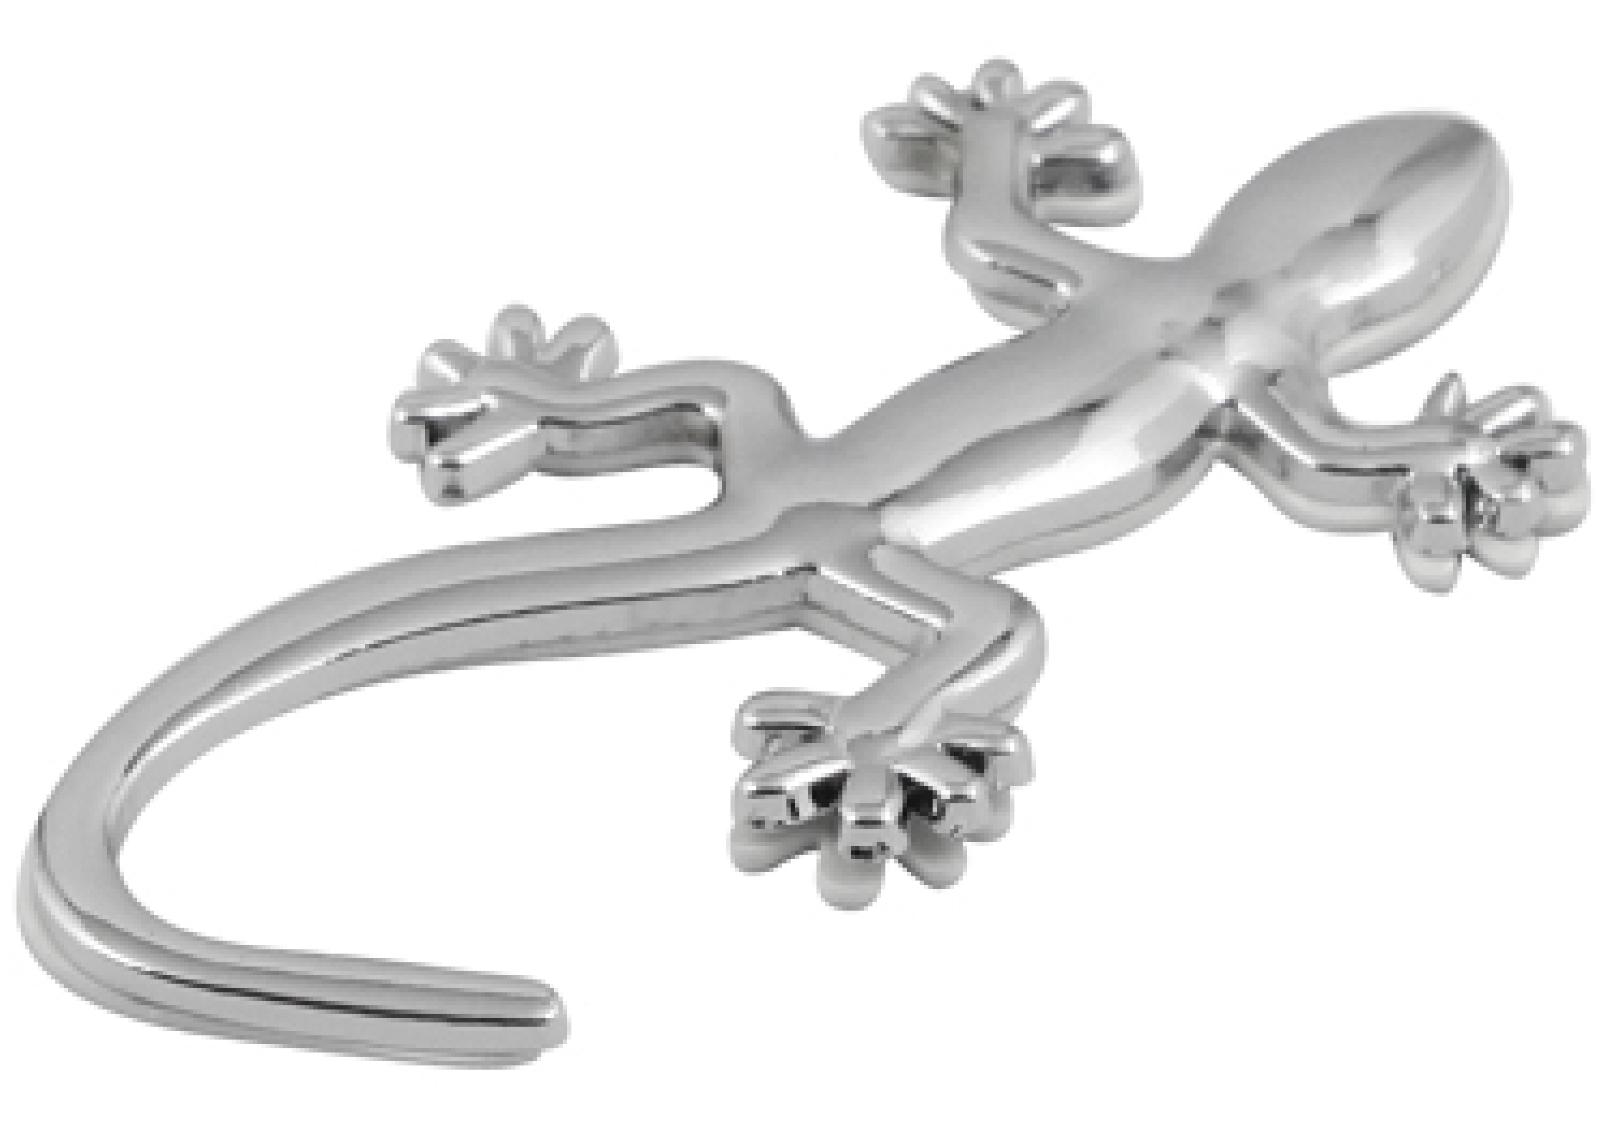 Adesivo auto Geko Gecko Lucertola 3D tuning cromat sticker decalcomania Fietsen en wielersport